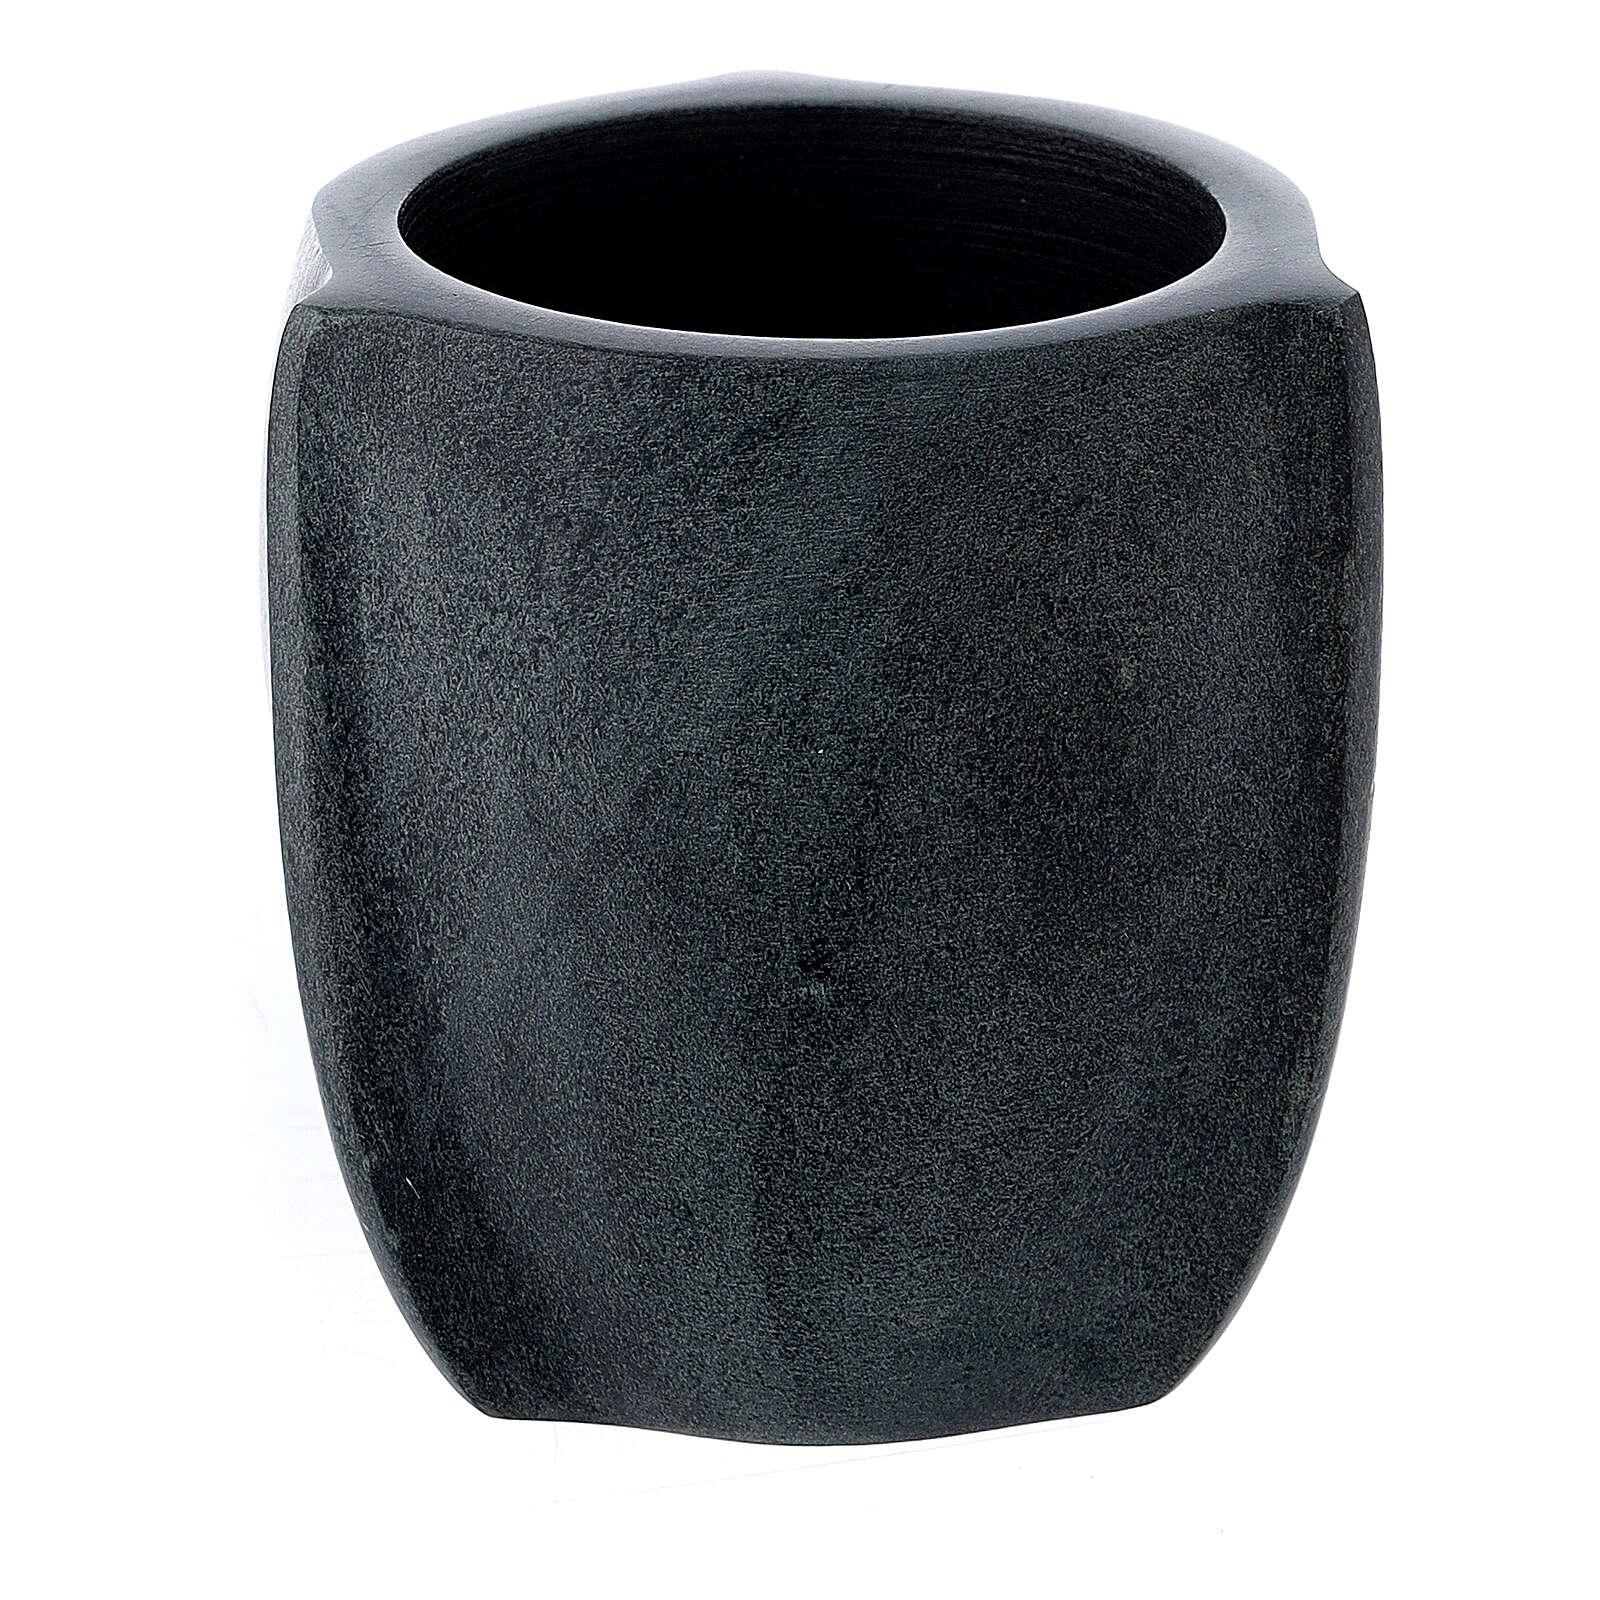 Pebetero esteatita oscura 6 cm 3